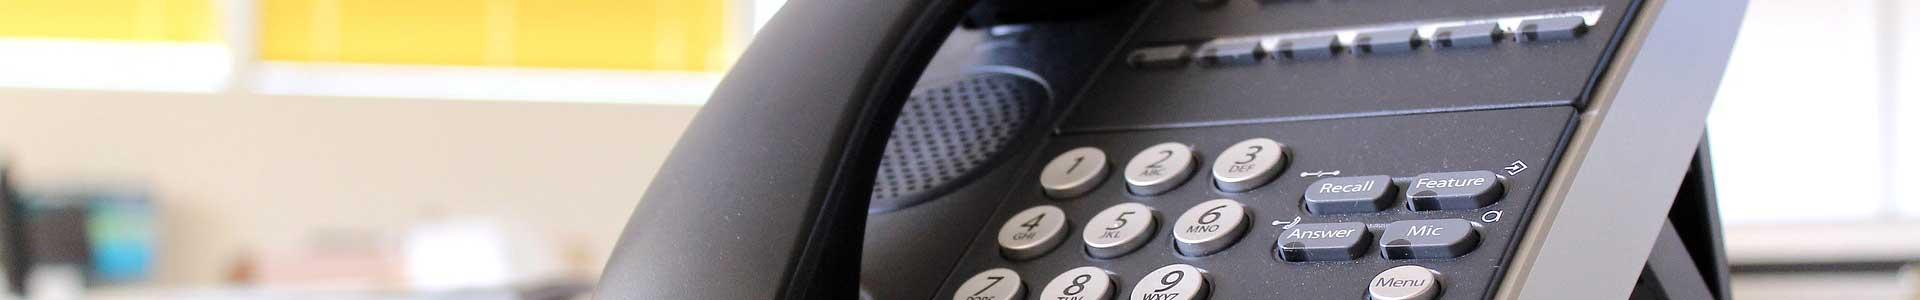 esp-systems telephone